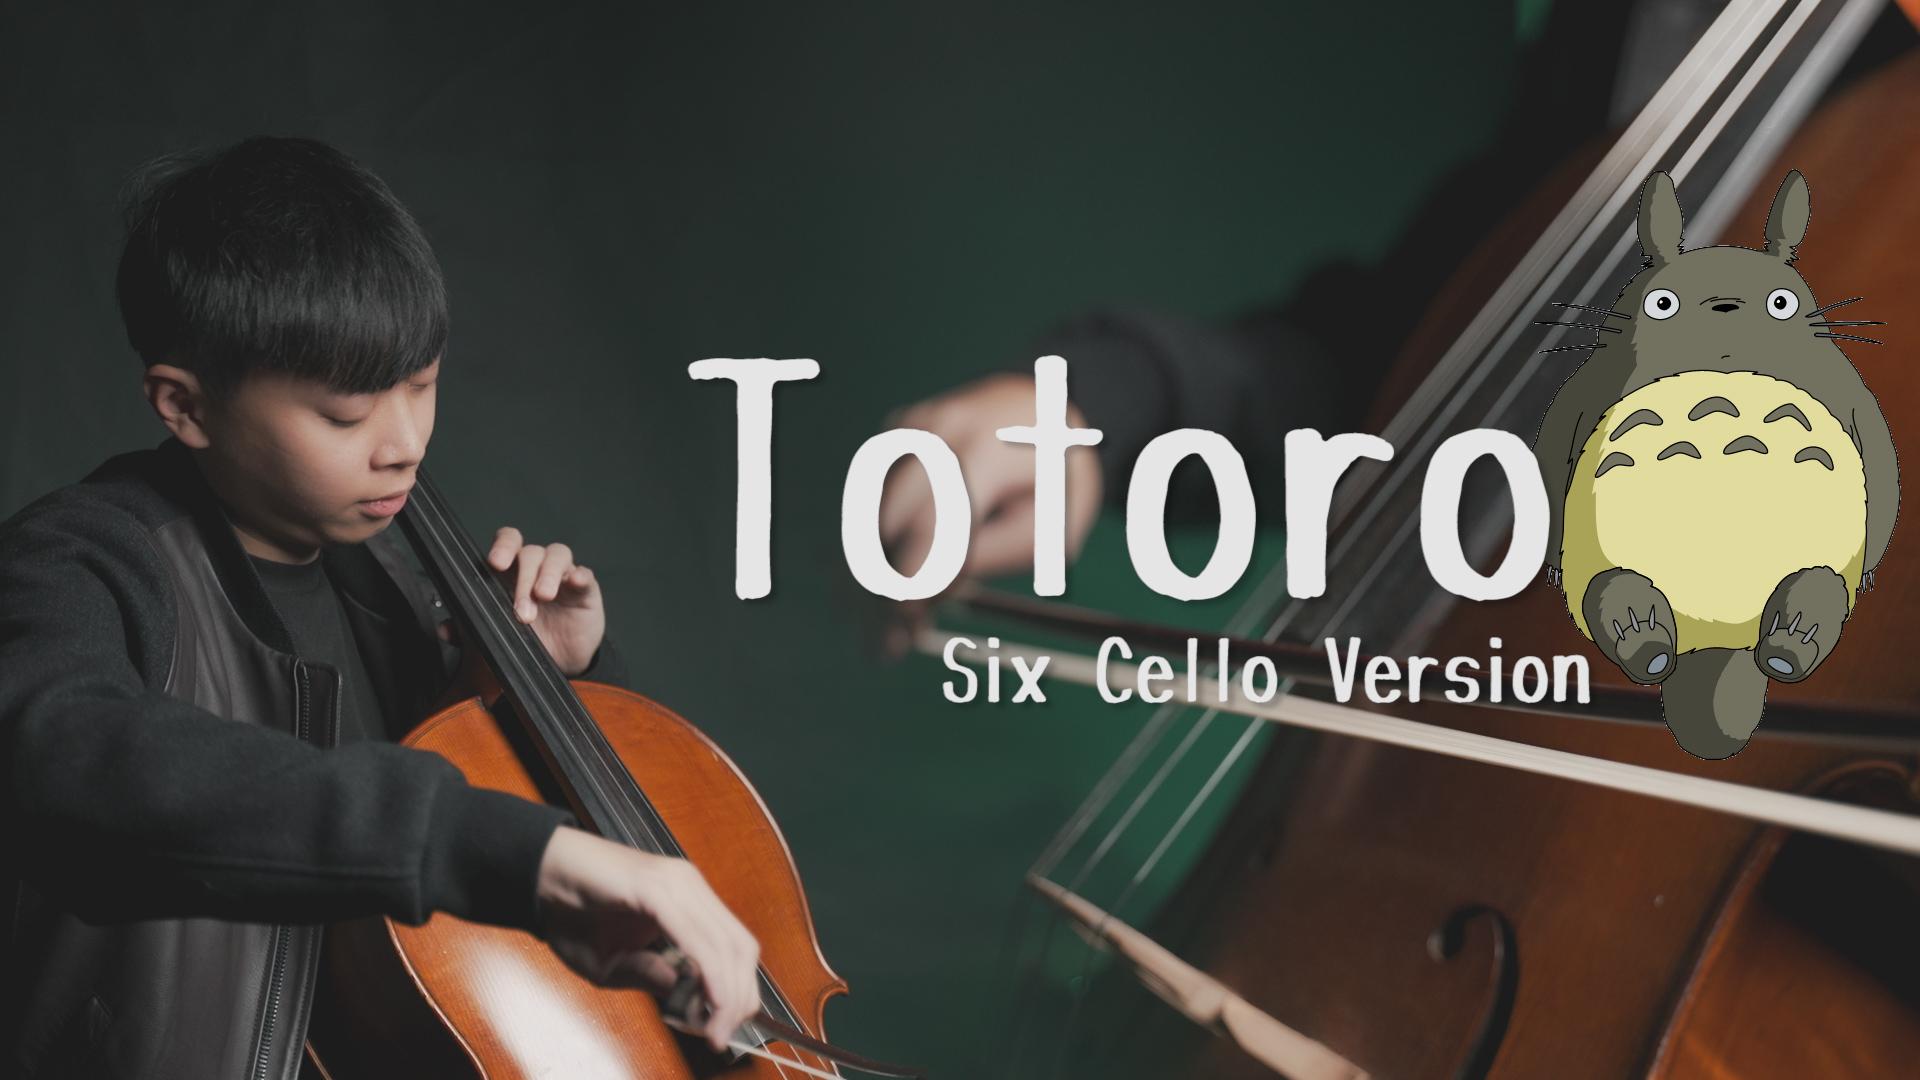 Totoro Theme  《龍貓主題曲》 宮崎駿動畫 - 久石讓   大提琴六重奏  Cello Sextet 『Cover by YoYo Cello』